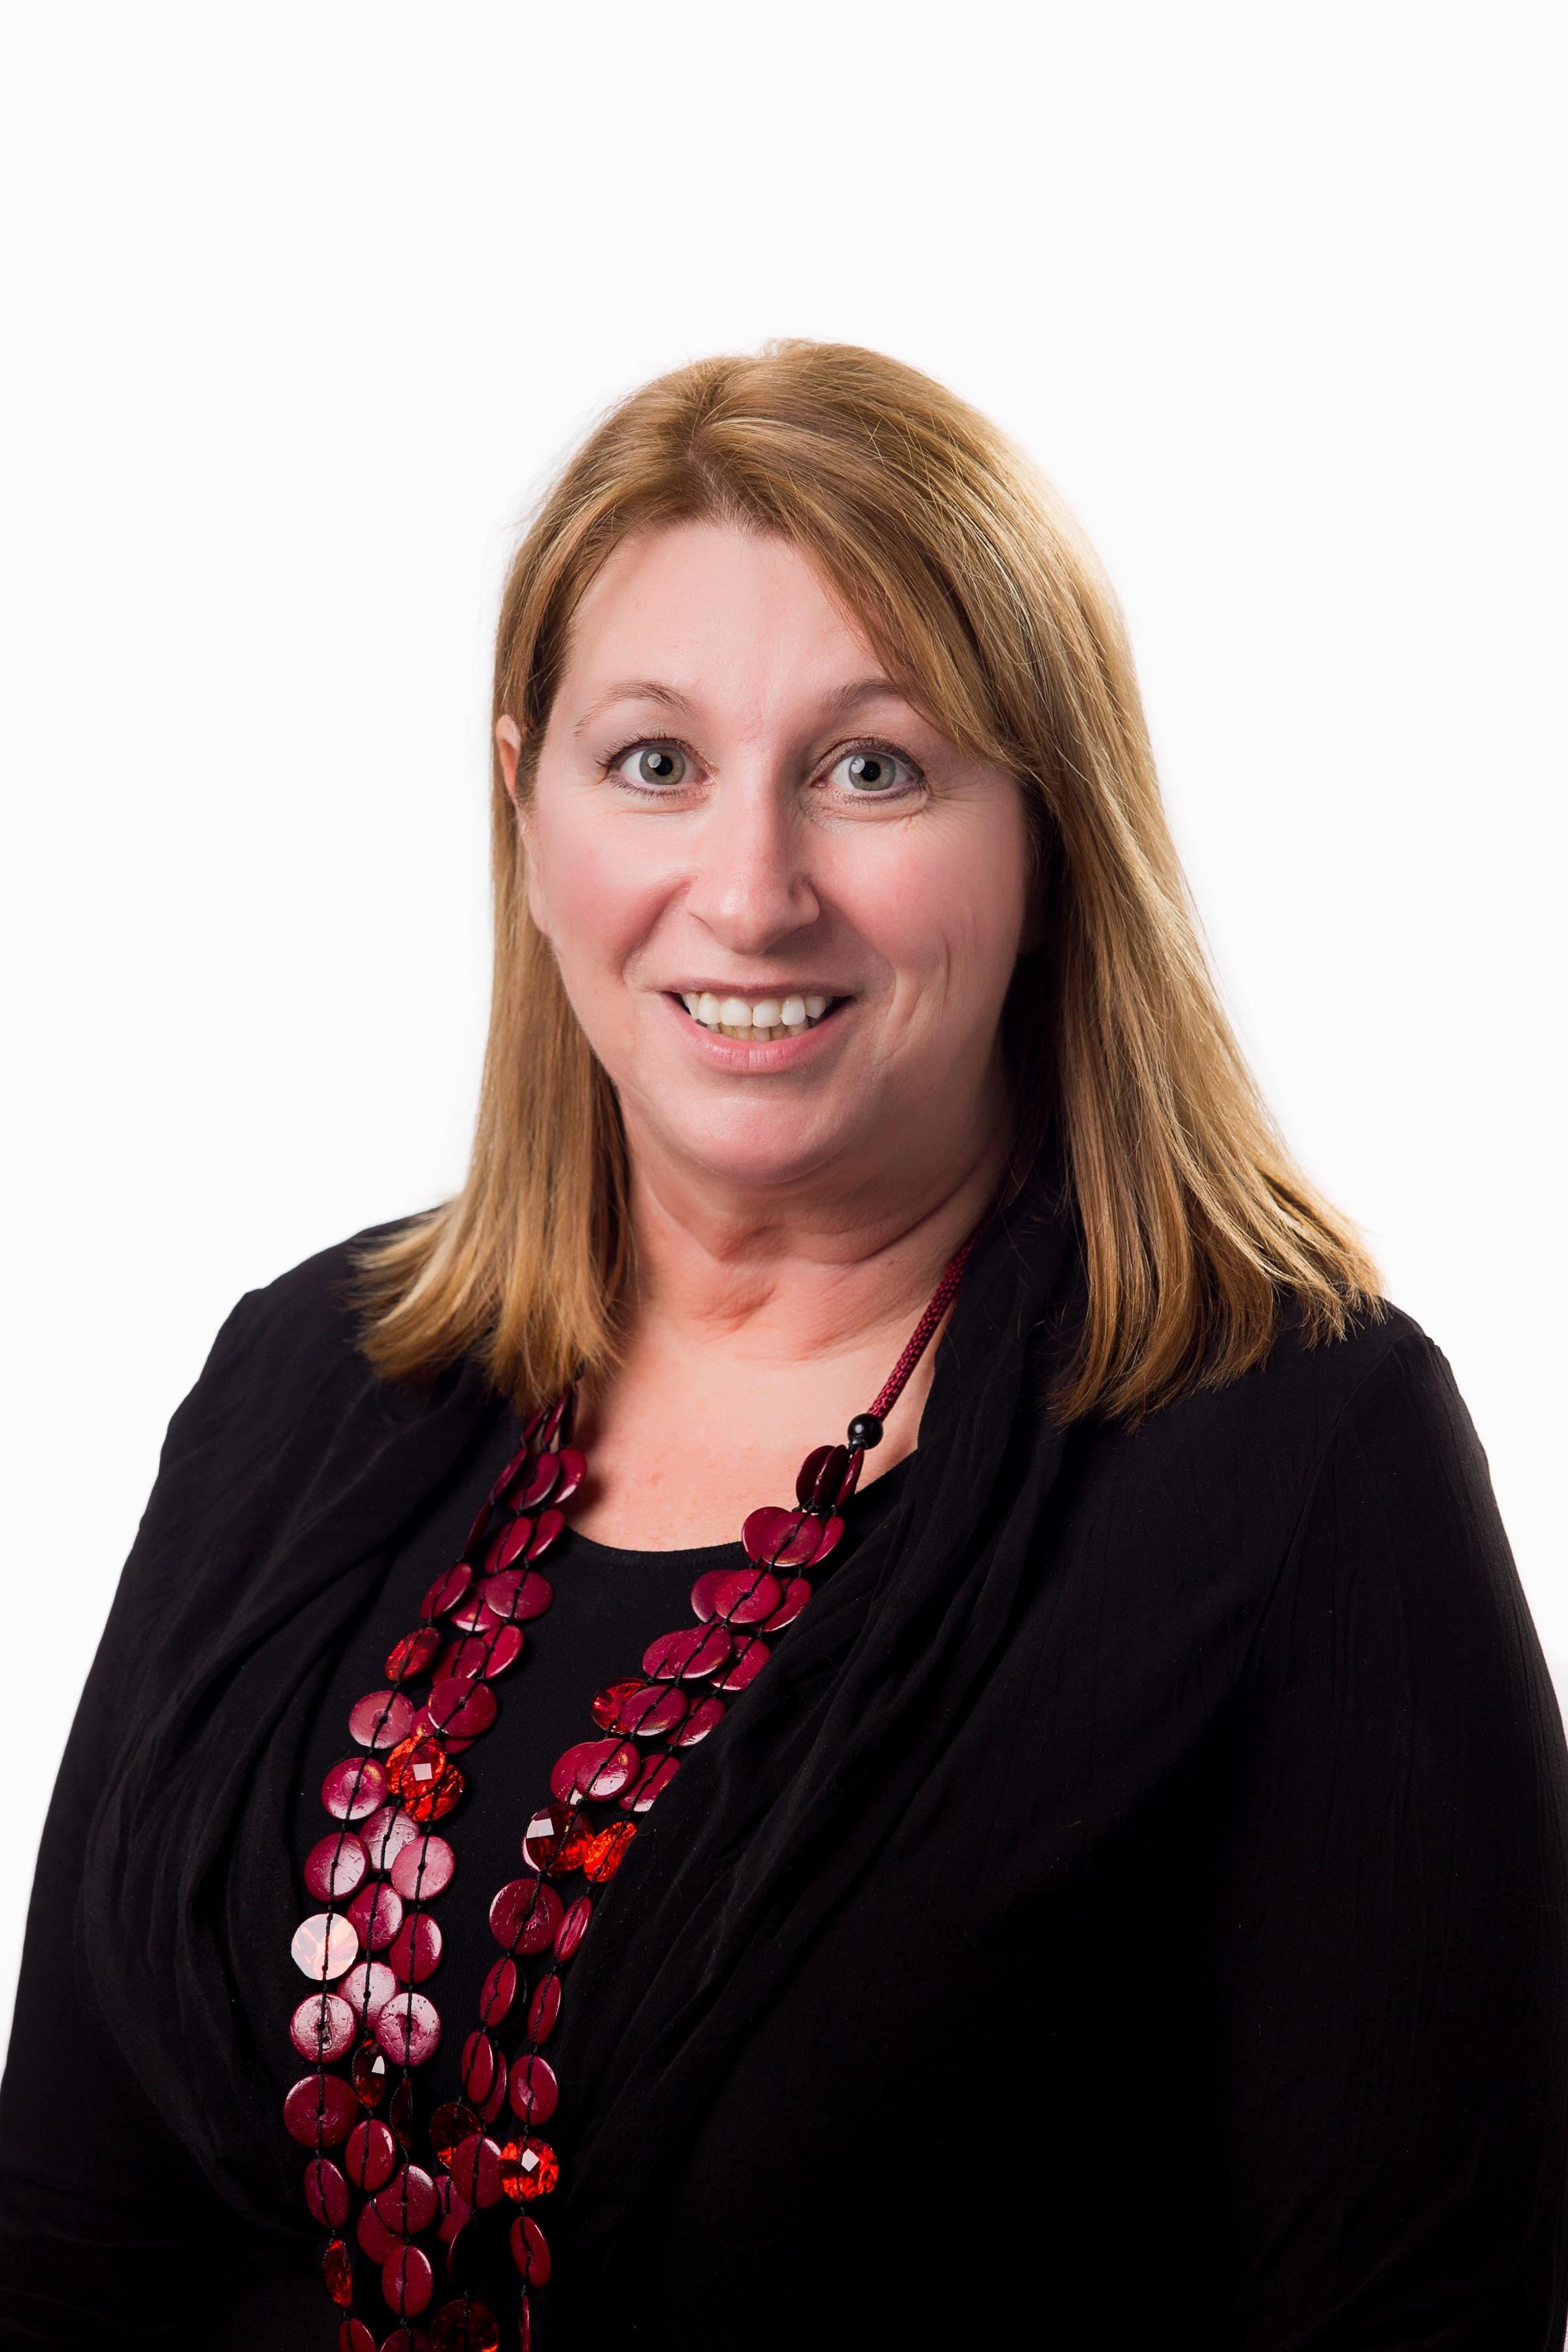 Profile picture of Jennifer McGinley